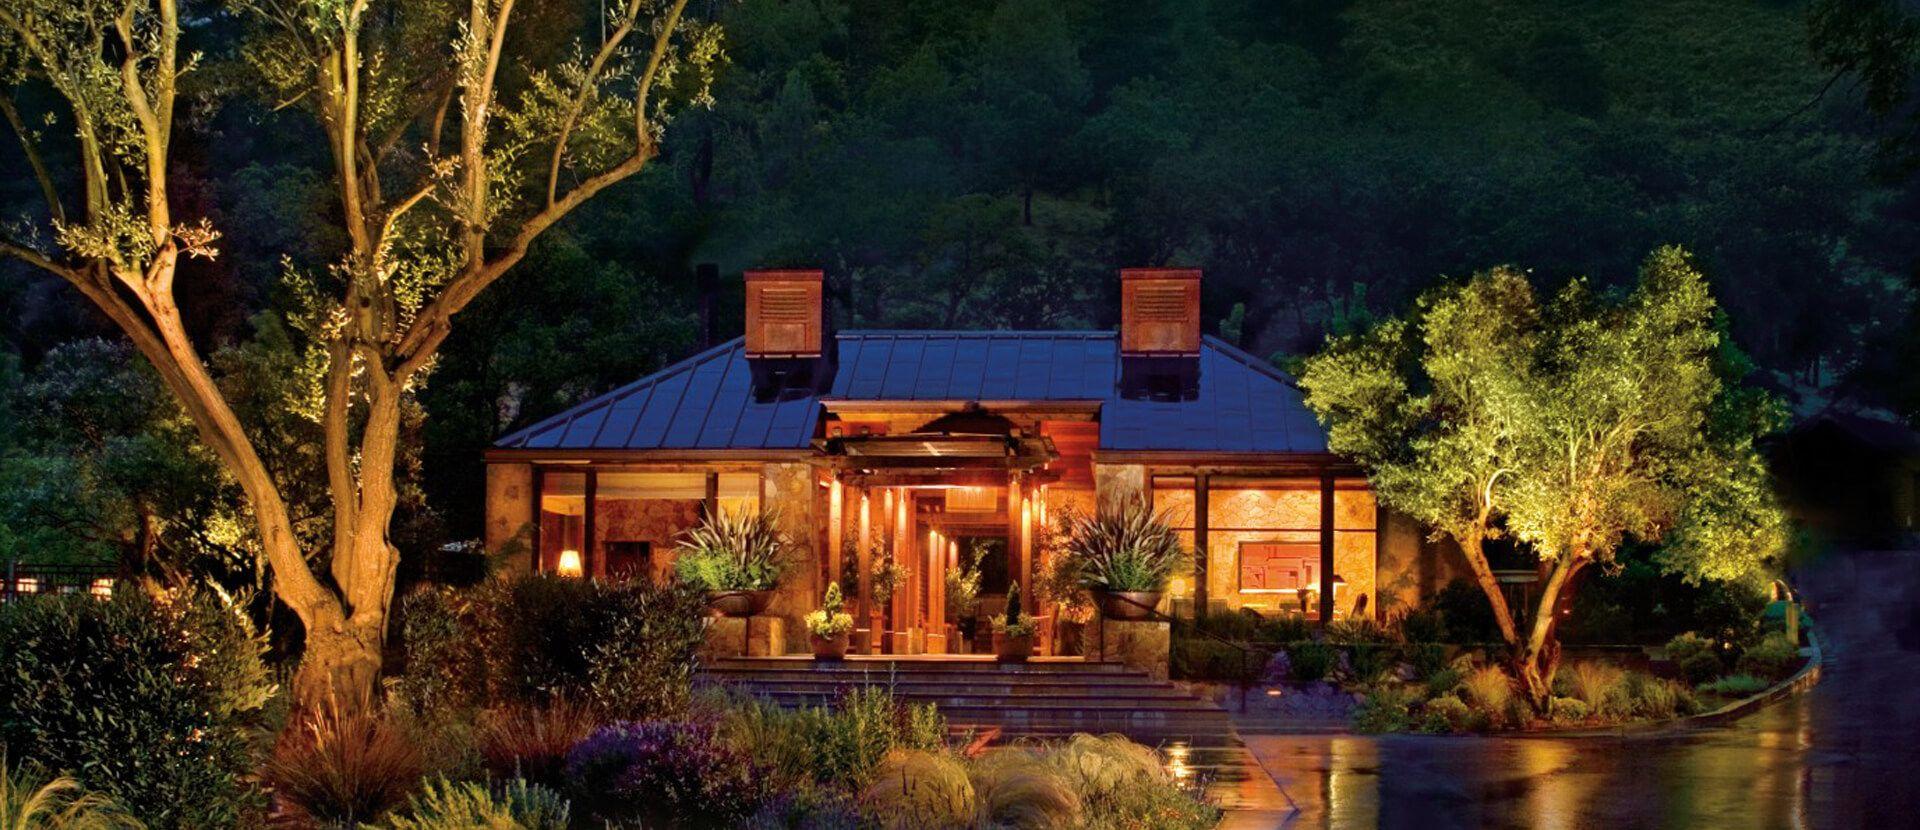 Calistoga Ranch, an Auberge Resort